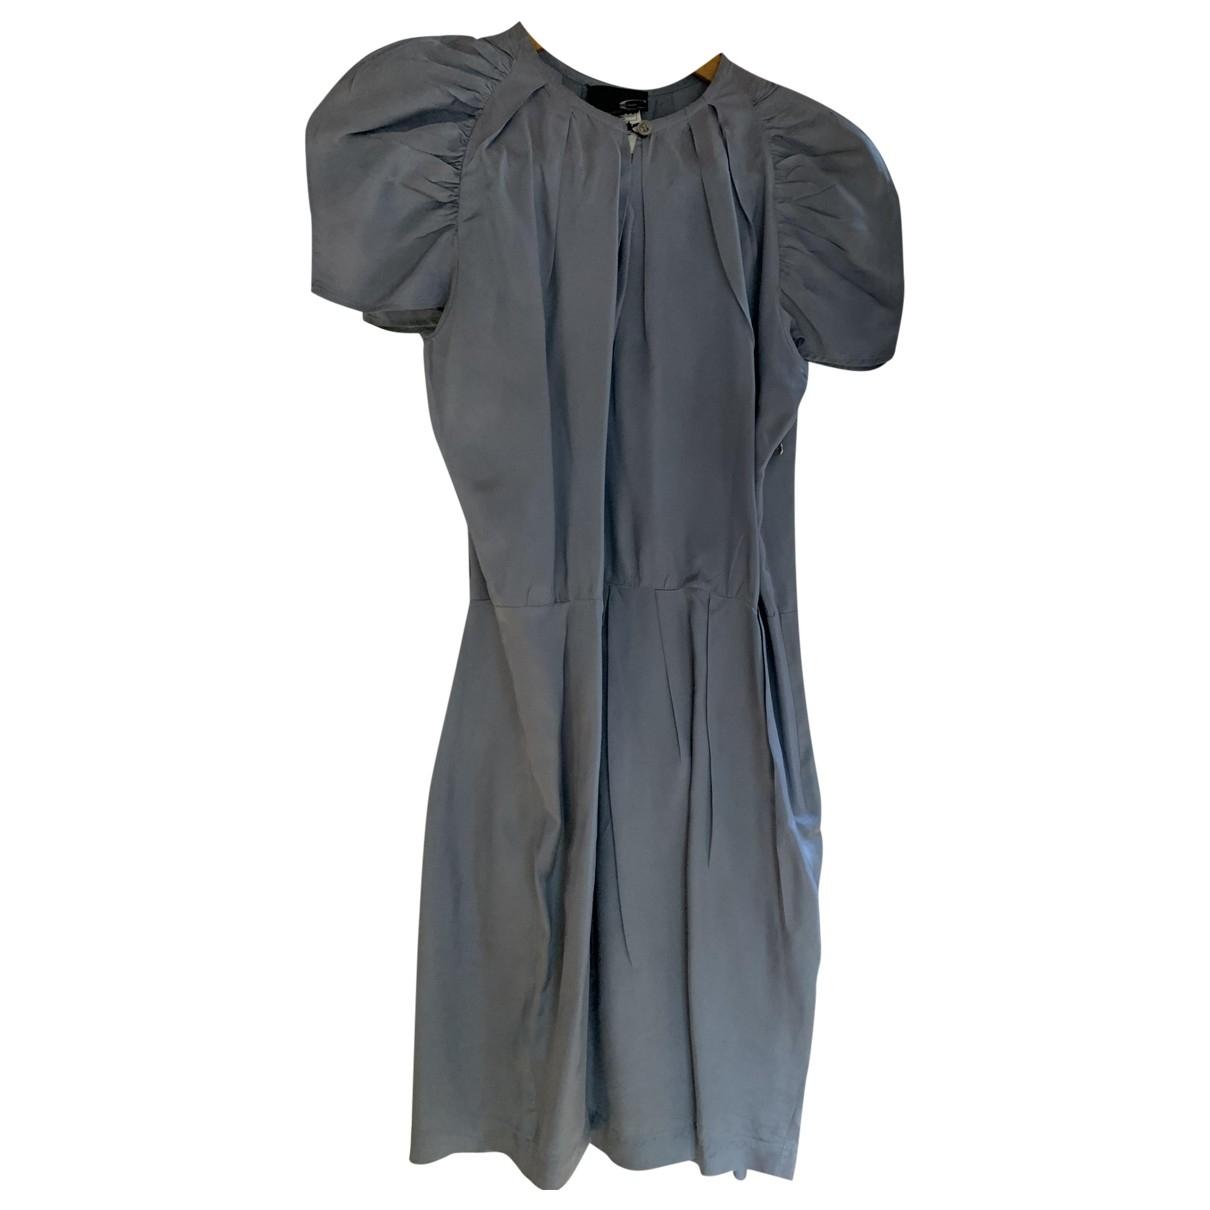 Just Cavalli \N Blue dress for Women 42 IT